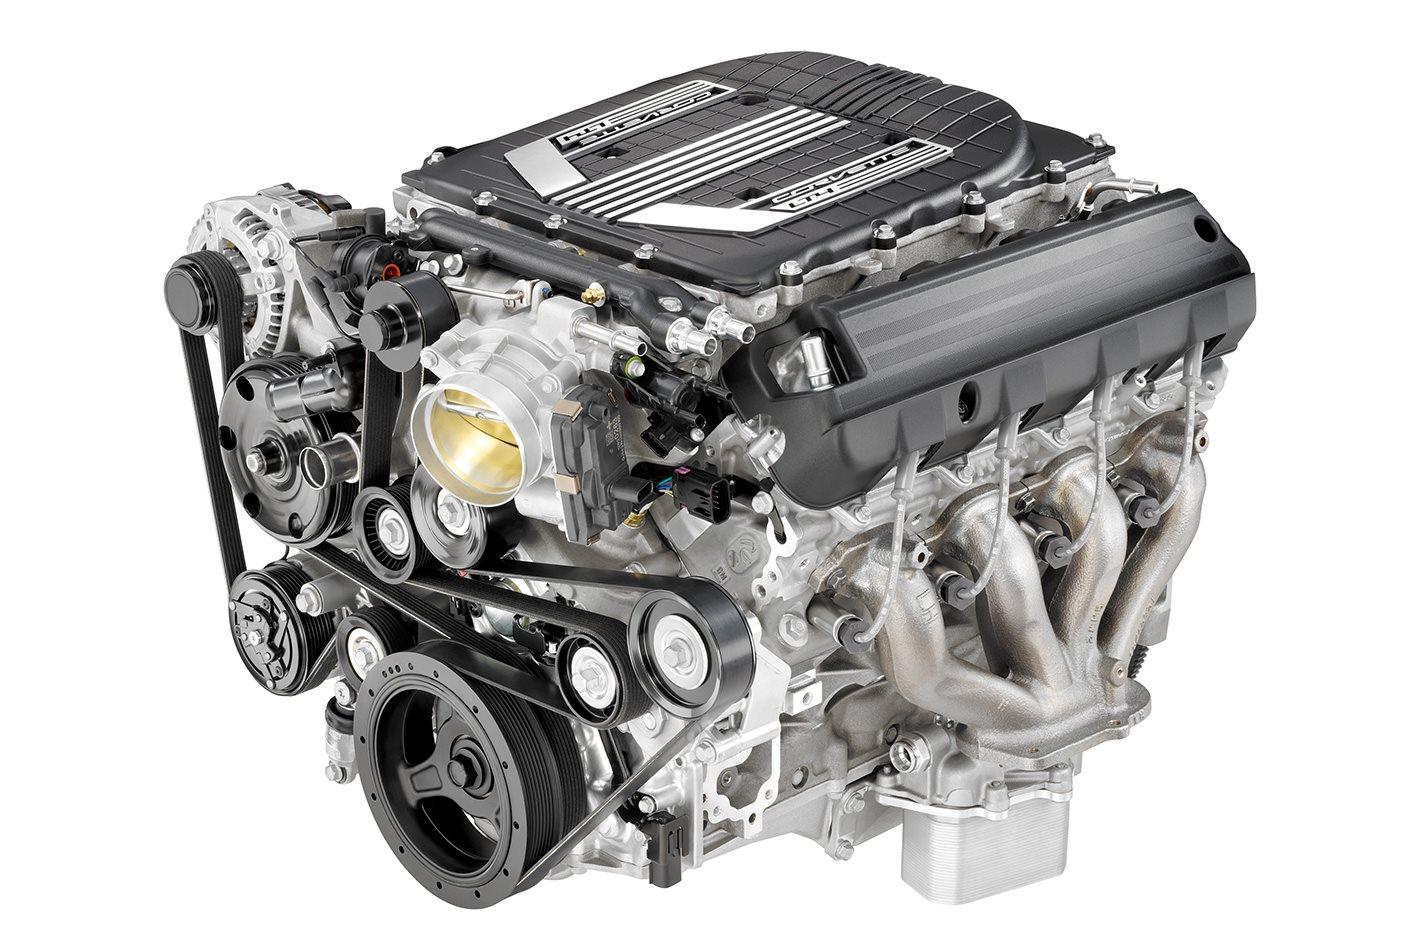 2018-Chevrolet-Camaro-ZL1-1LE-engine.jpg